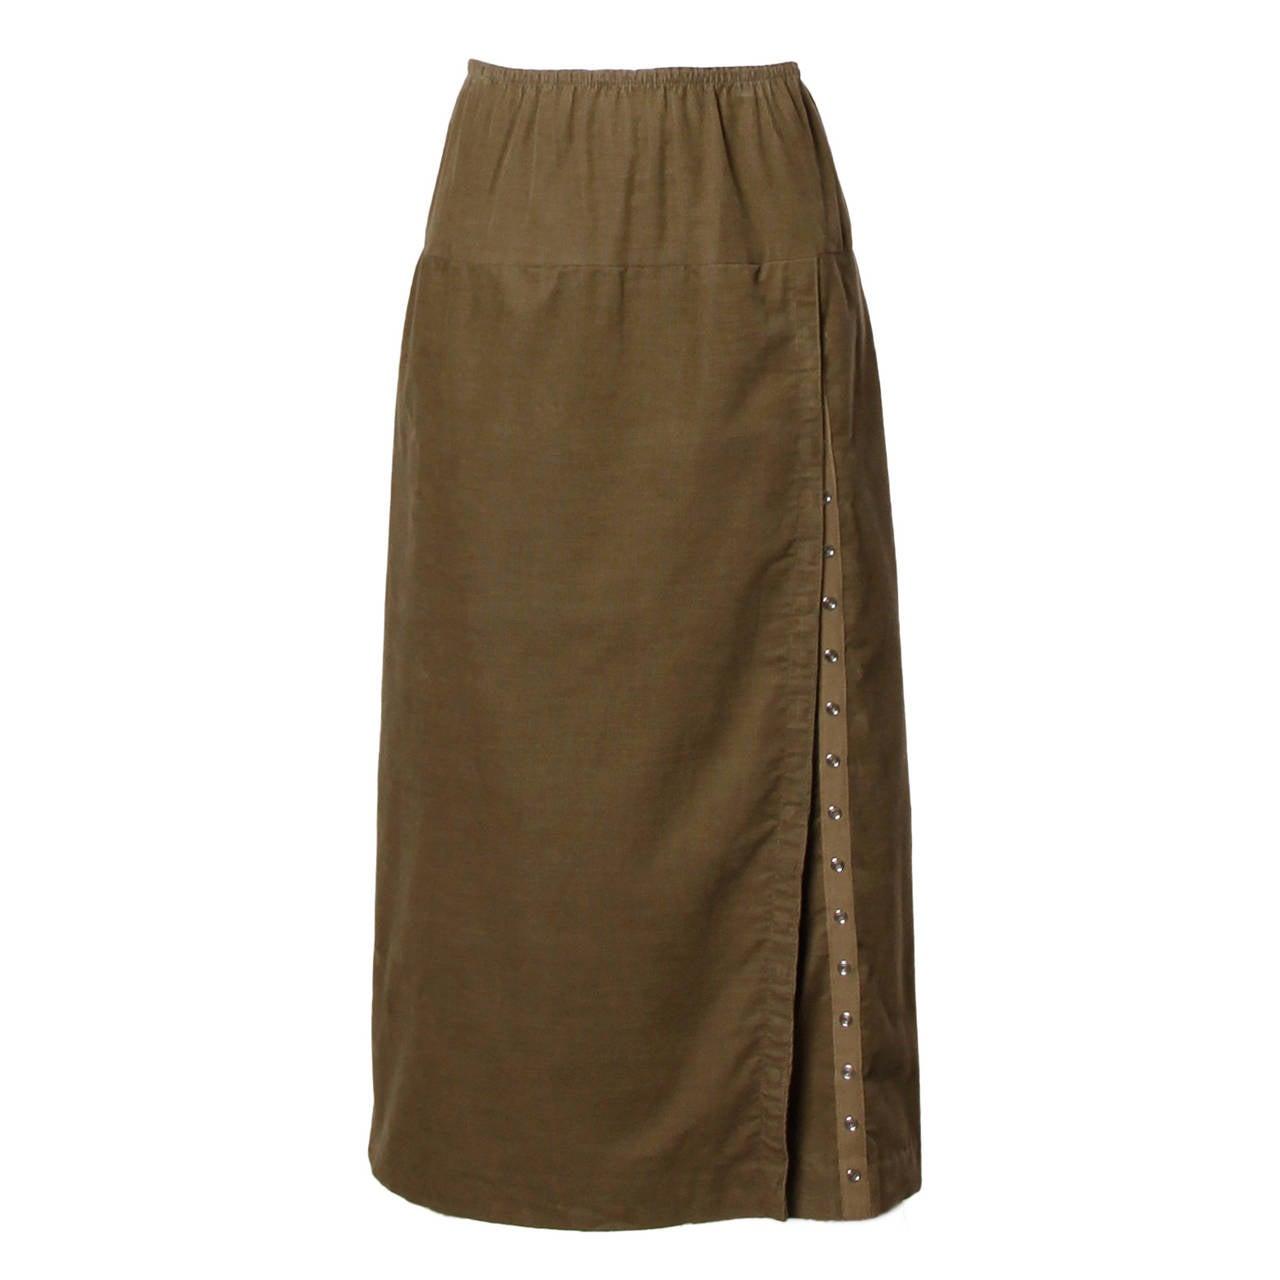 Norma Kamali Vintage Avant Garde Skirt